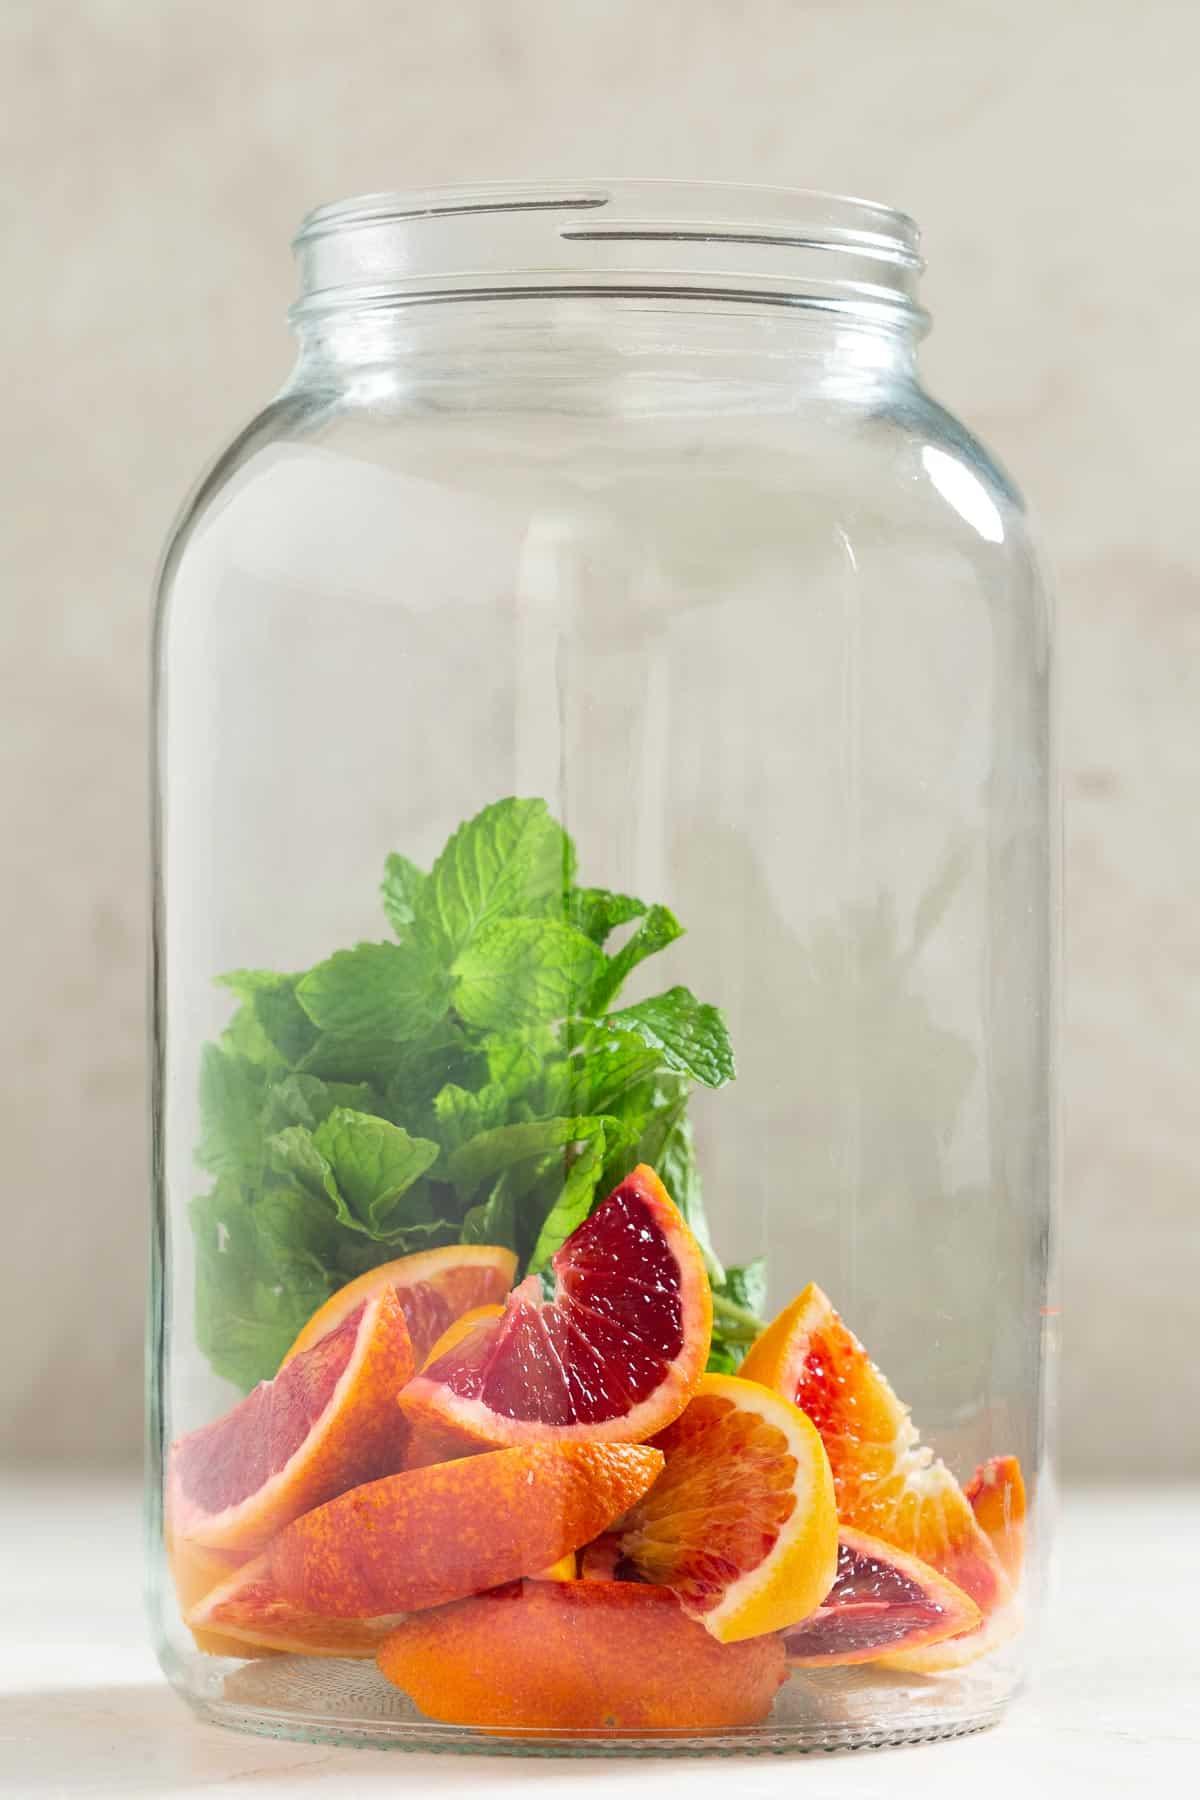 Large glass jug half full of orange slices and mint leaves